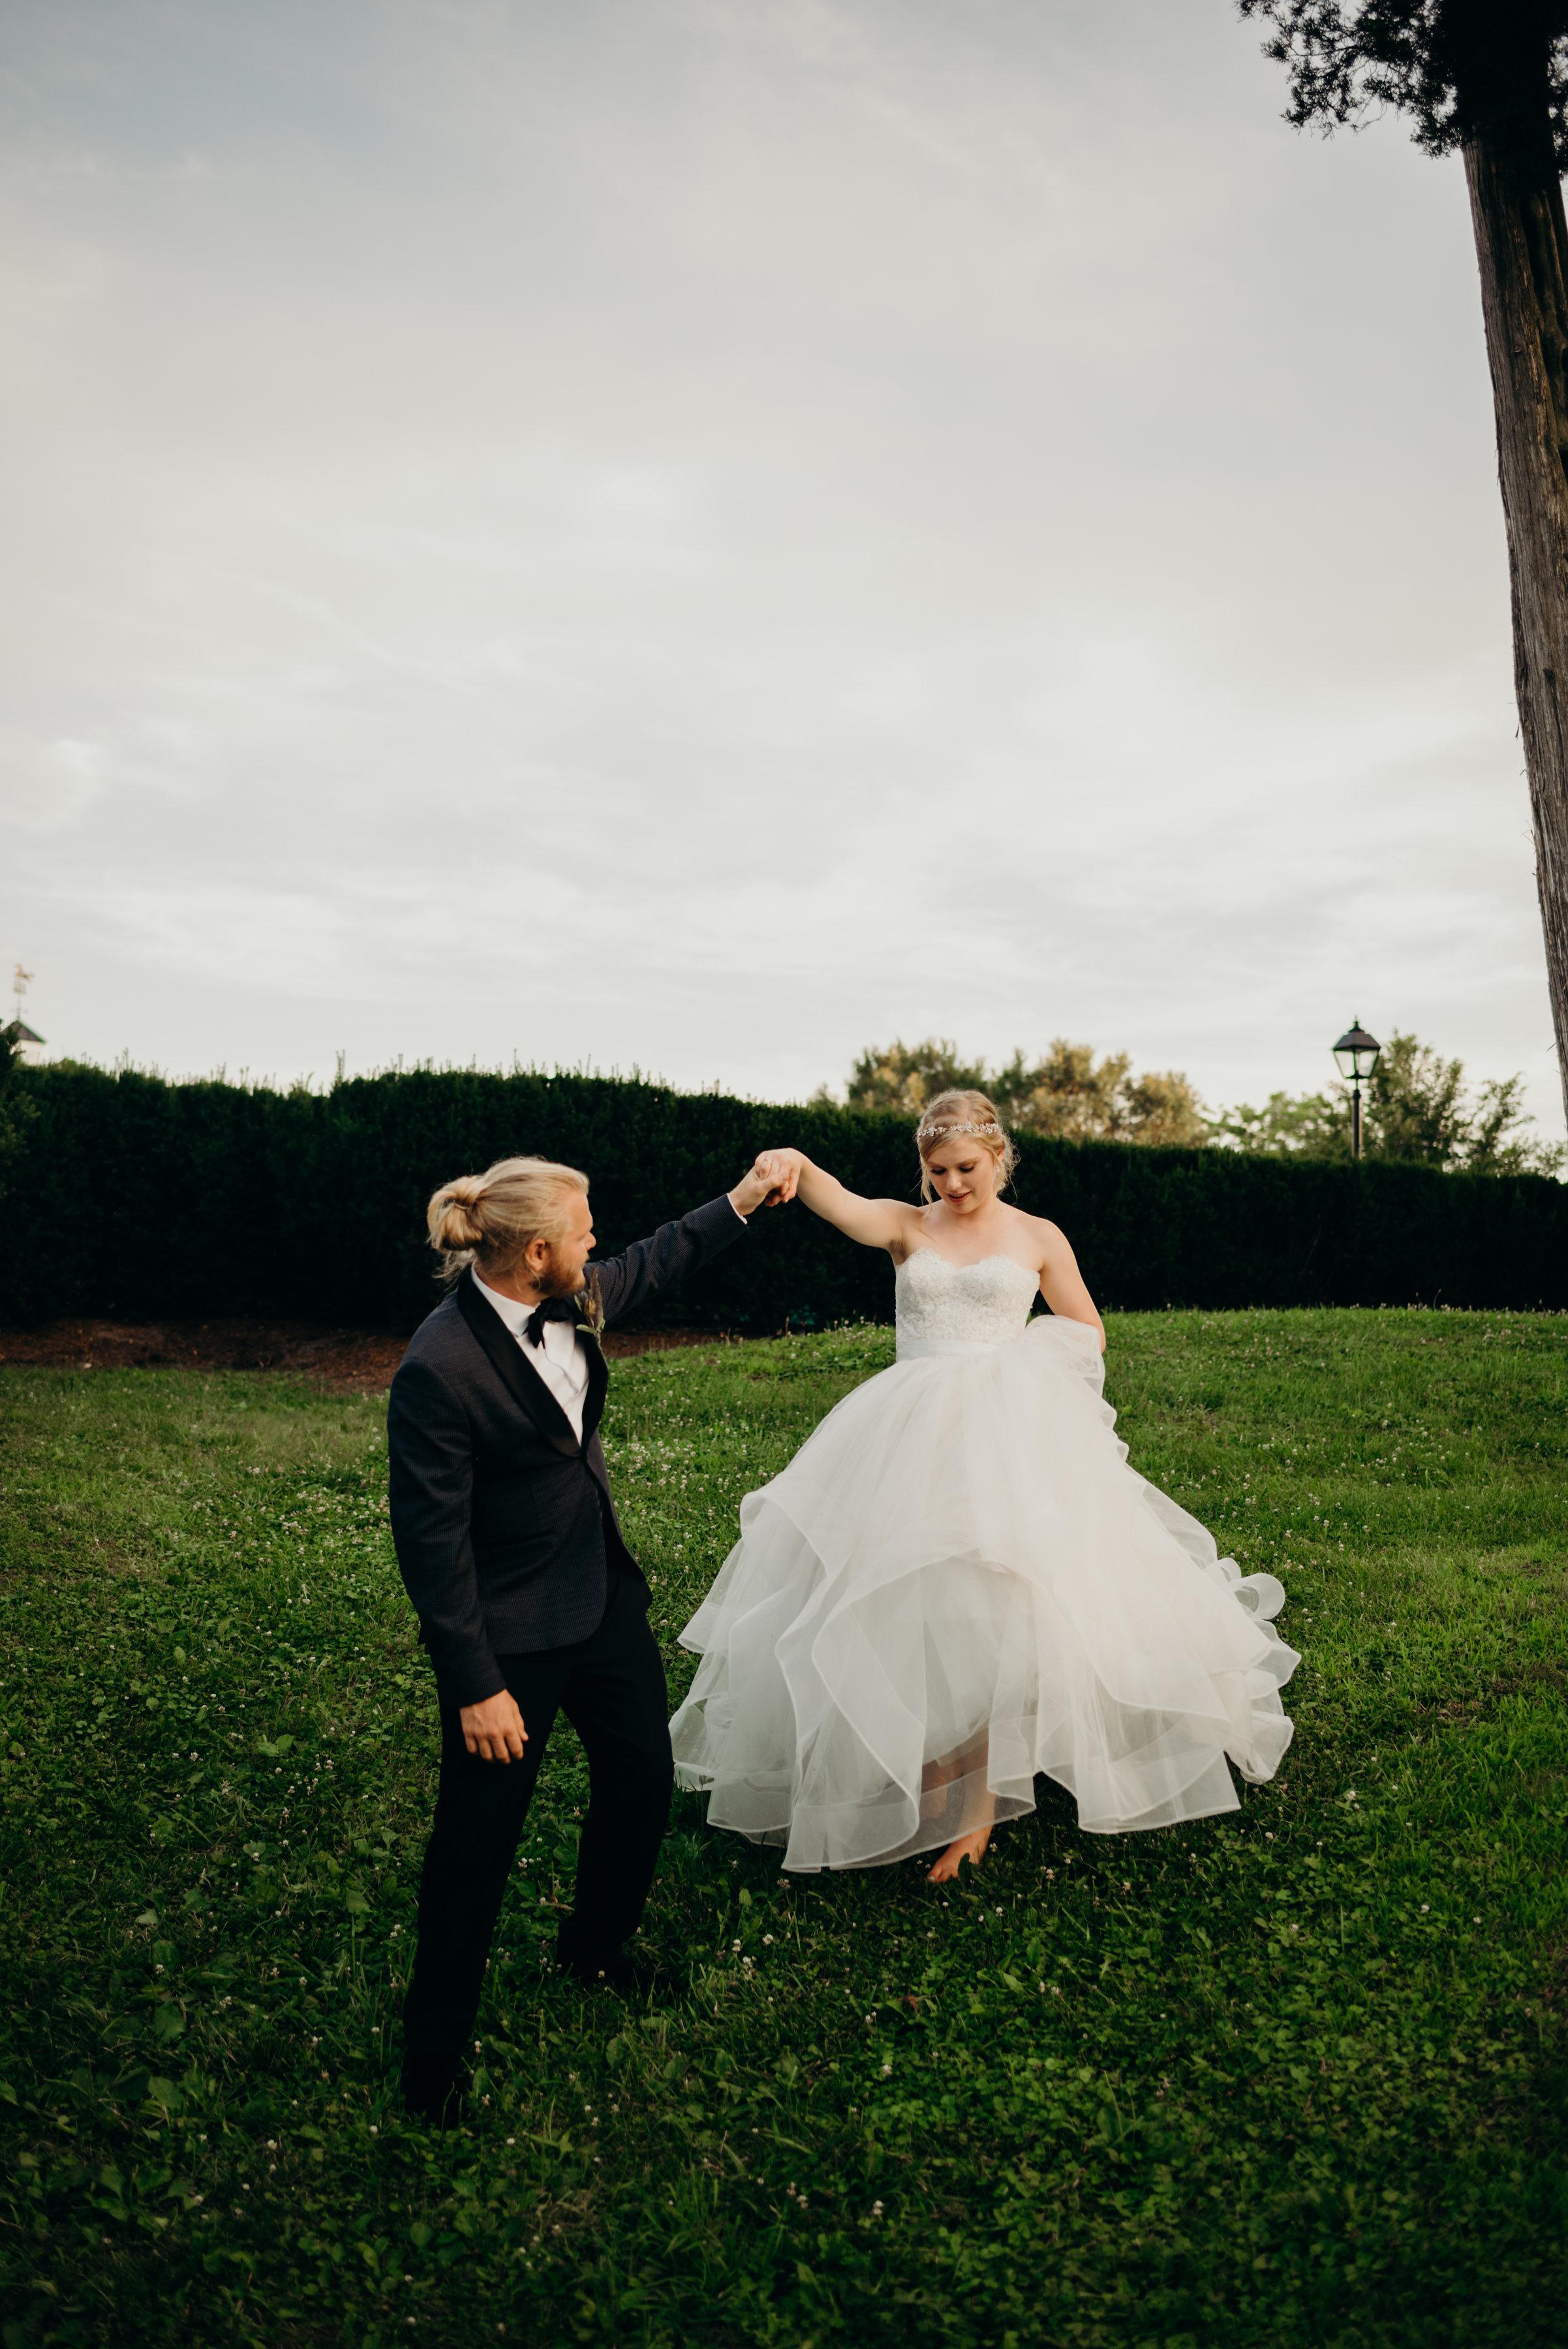 emma-josh-virginia-wedding-middleburg-community-center-7024.jpg